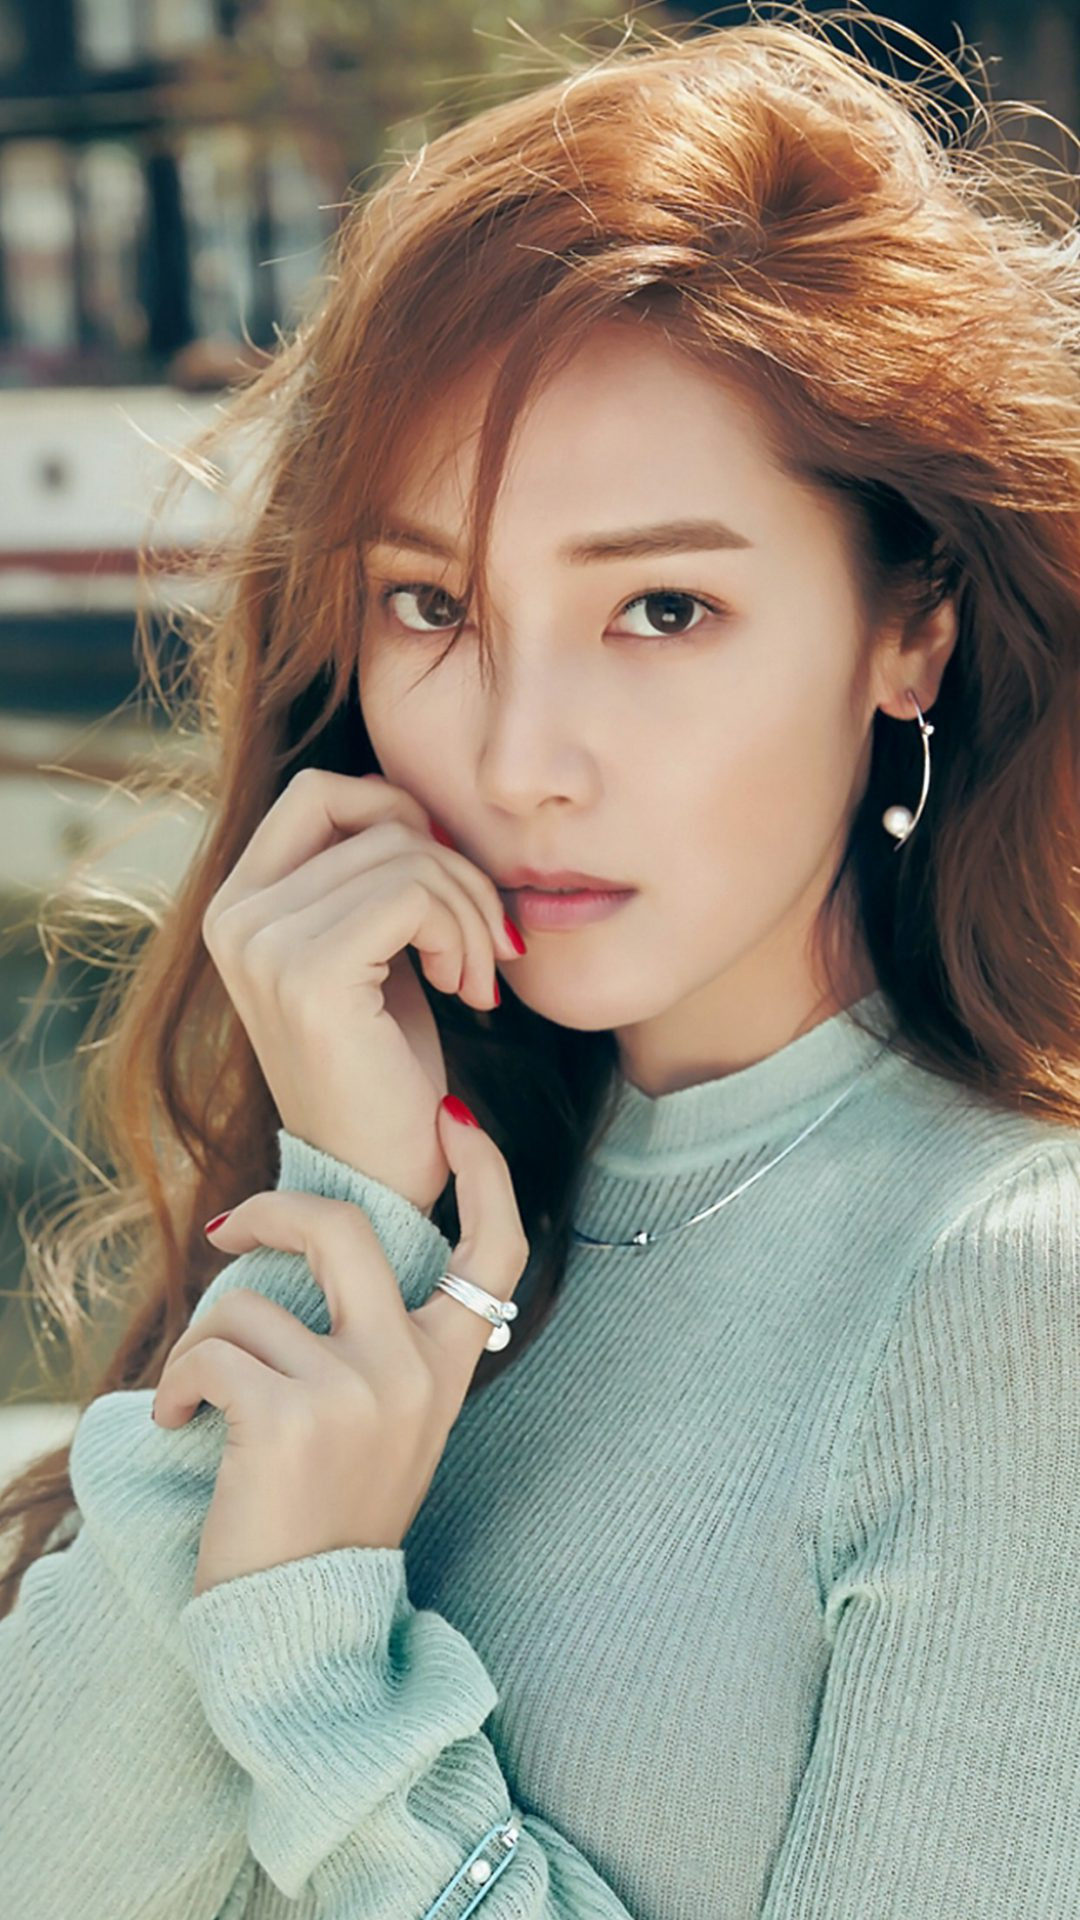 Jessica Kpop Girl Snsd Cute Woman